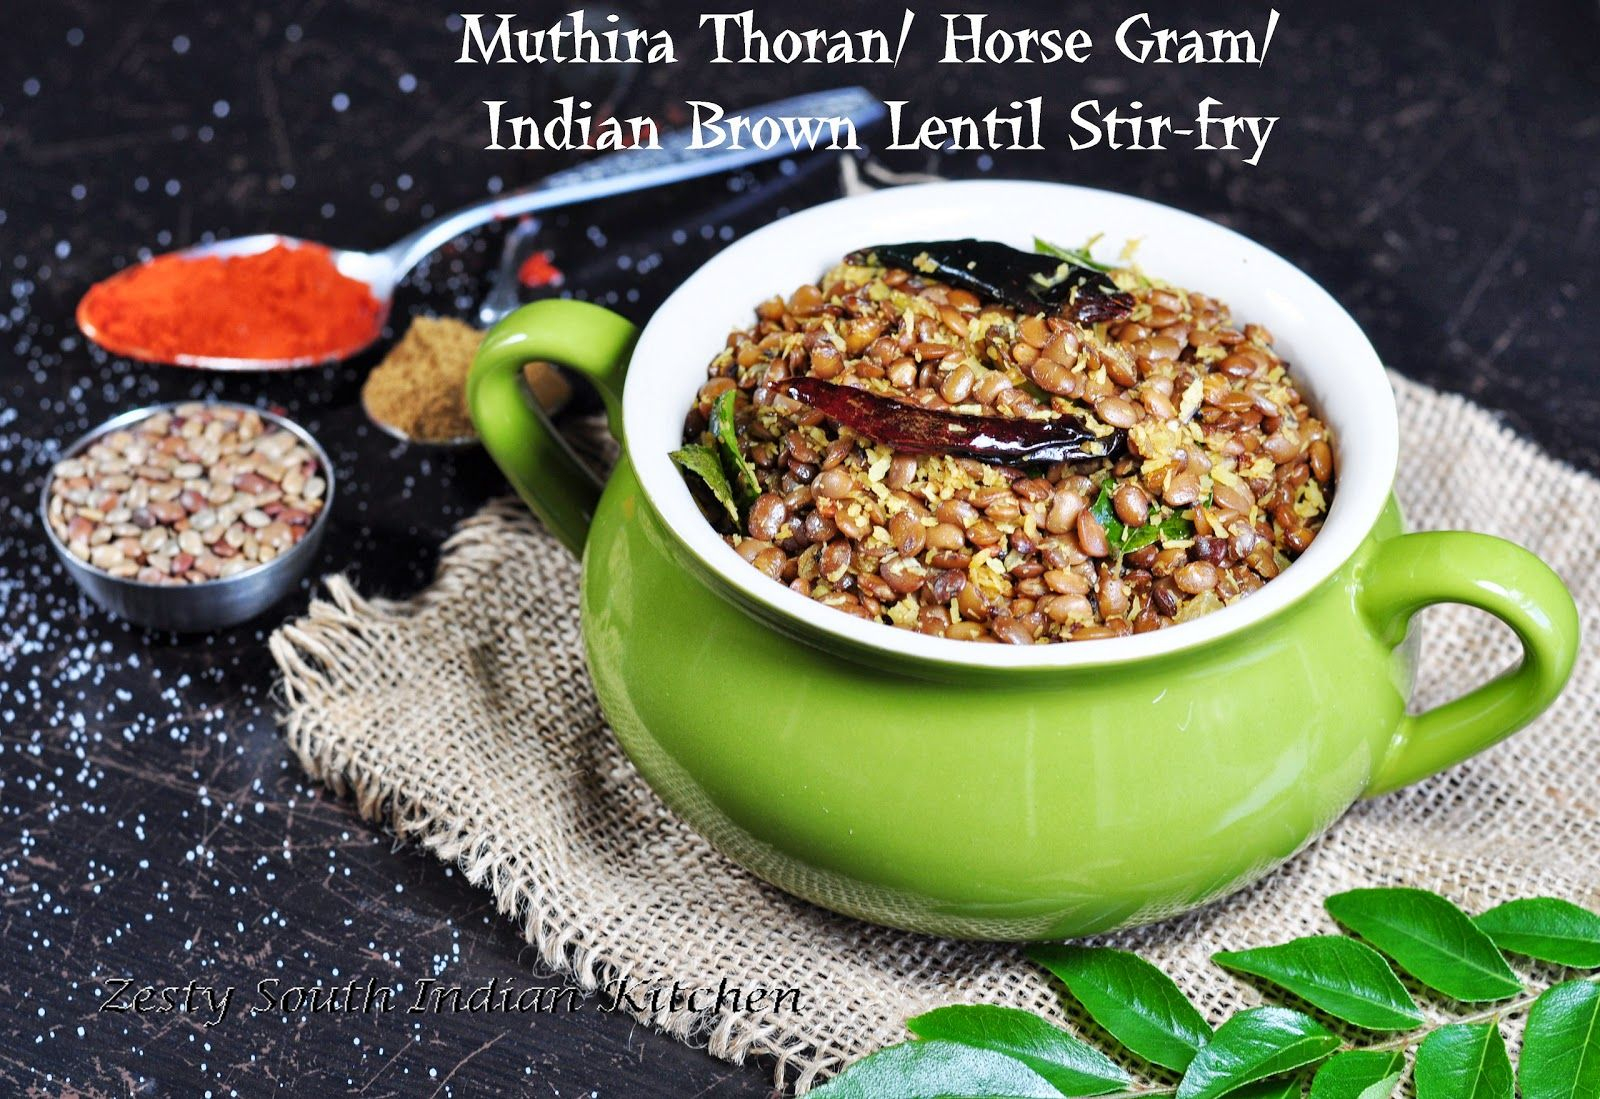 Muthira Thoran/ Horse Gram/ Indian Brown Lentils Stirfry